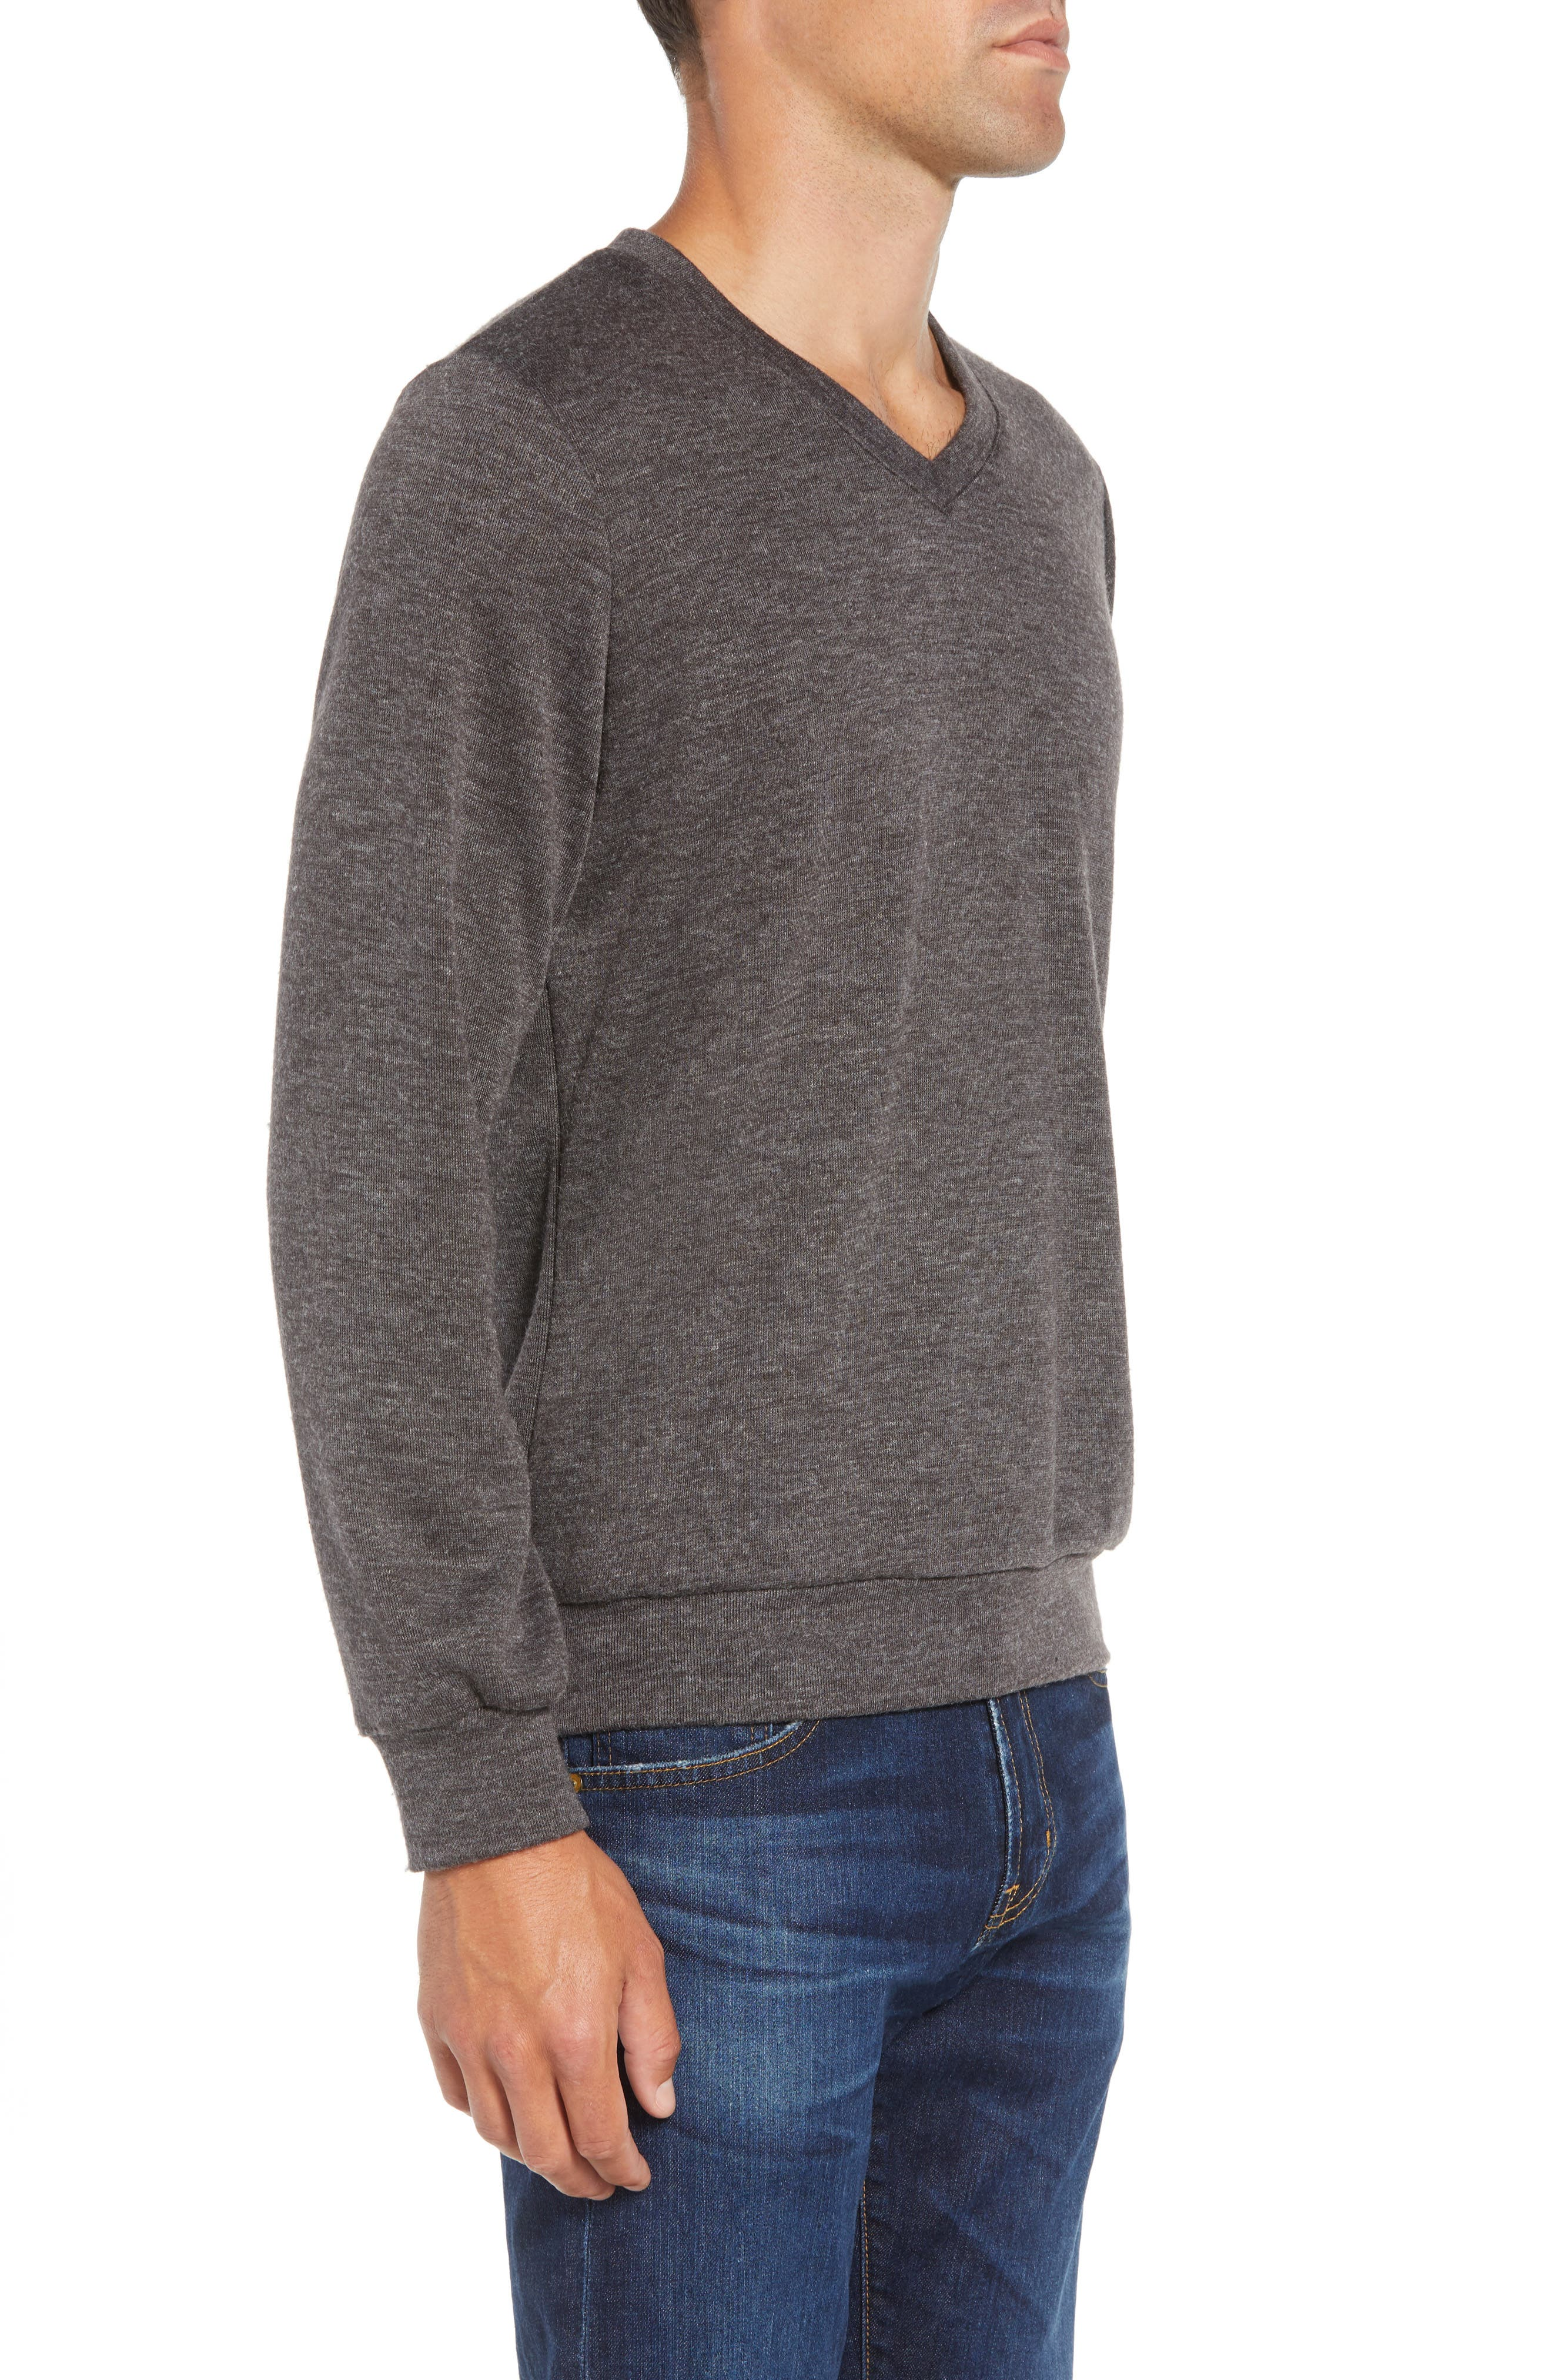 Prospect V-Neck Performance Sweater,                             Alternate thumbnail 3, color,                             CHARCOAL